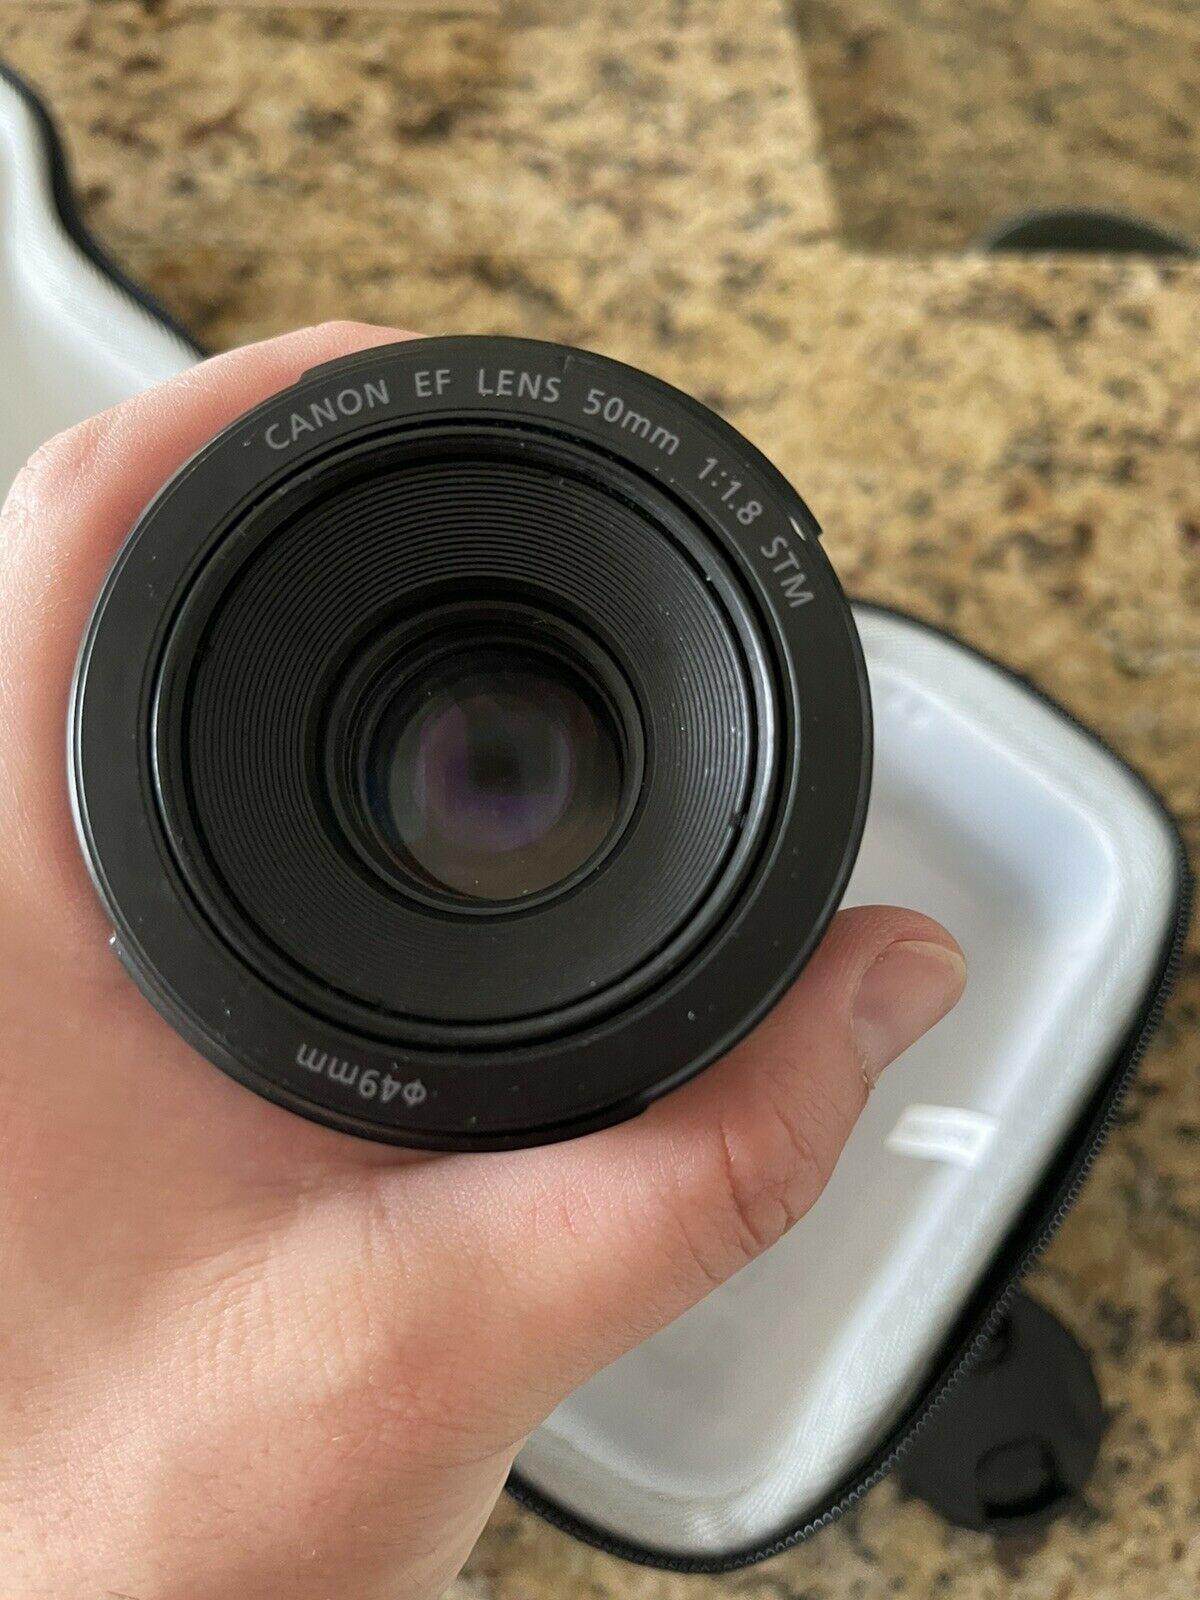 Canon EOS 5D Mark III Digital SLR Camera 50m Lens And Extras.